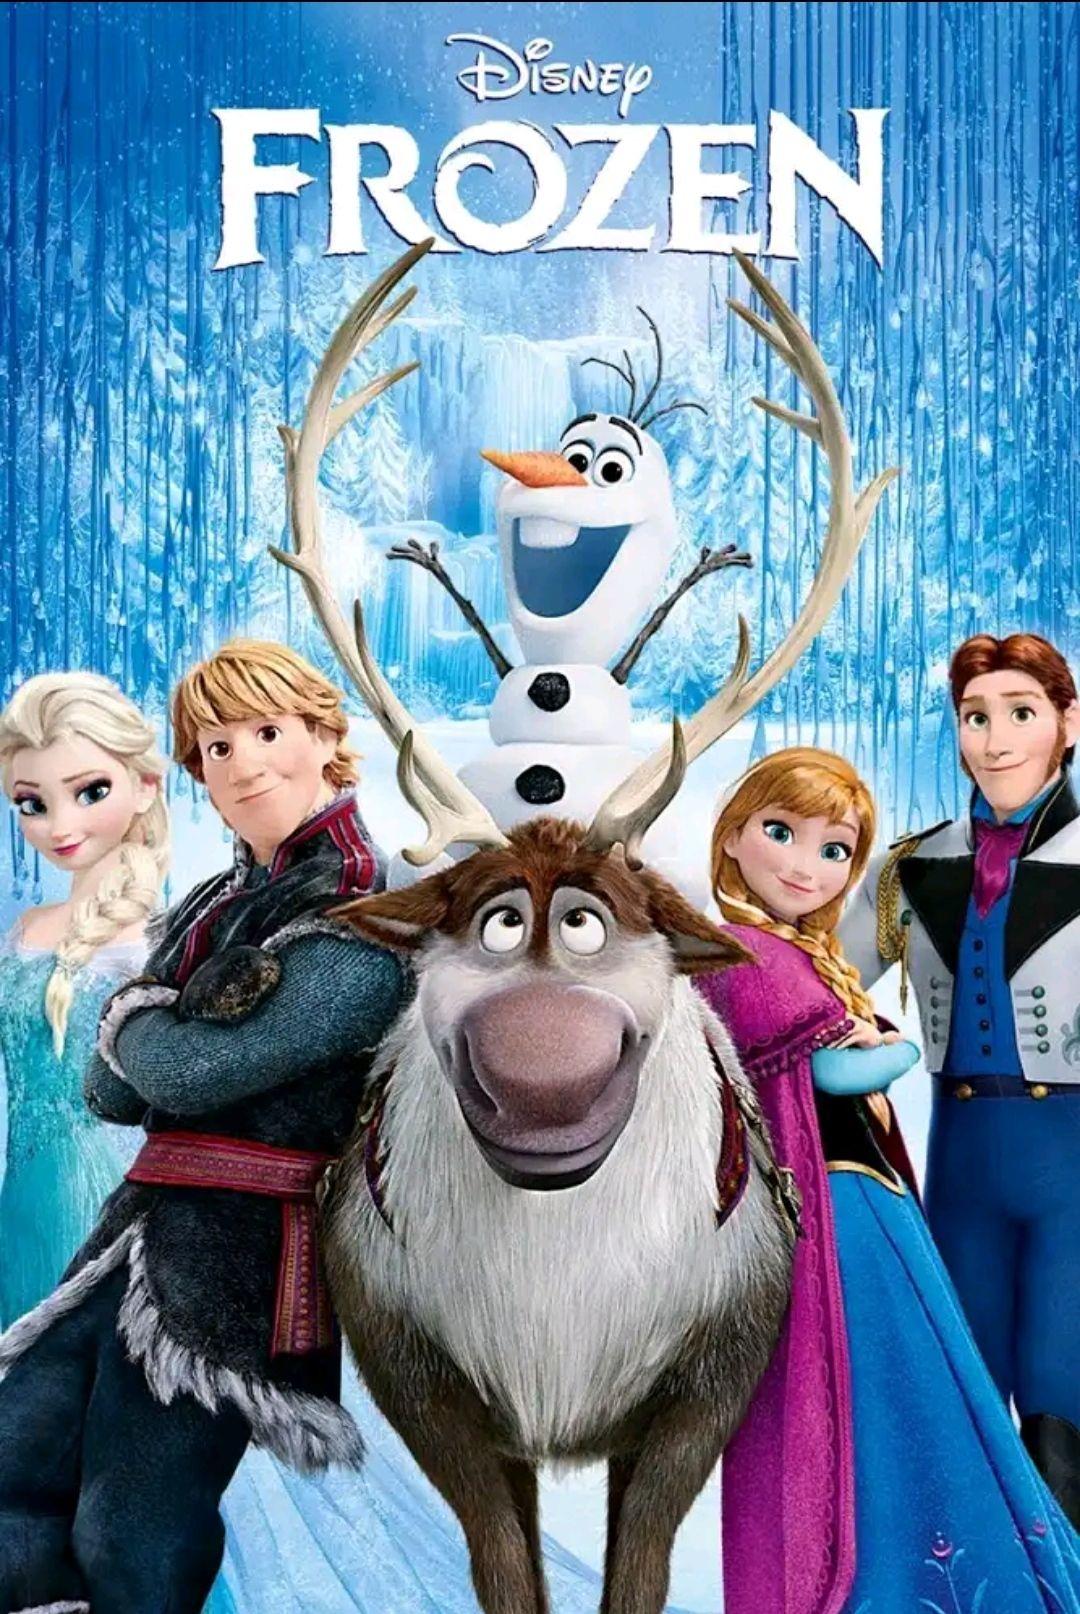 Frozen HD digital on Google Play Movies £6.99